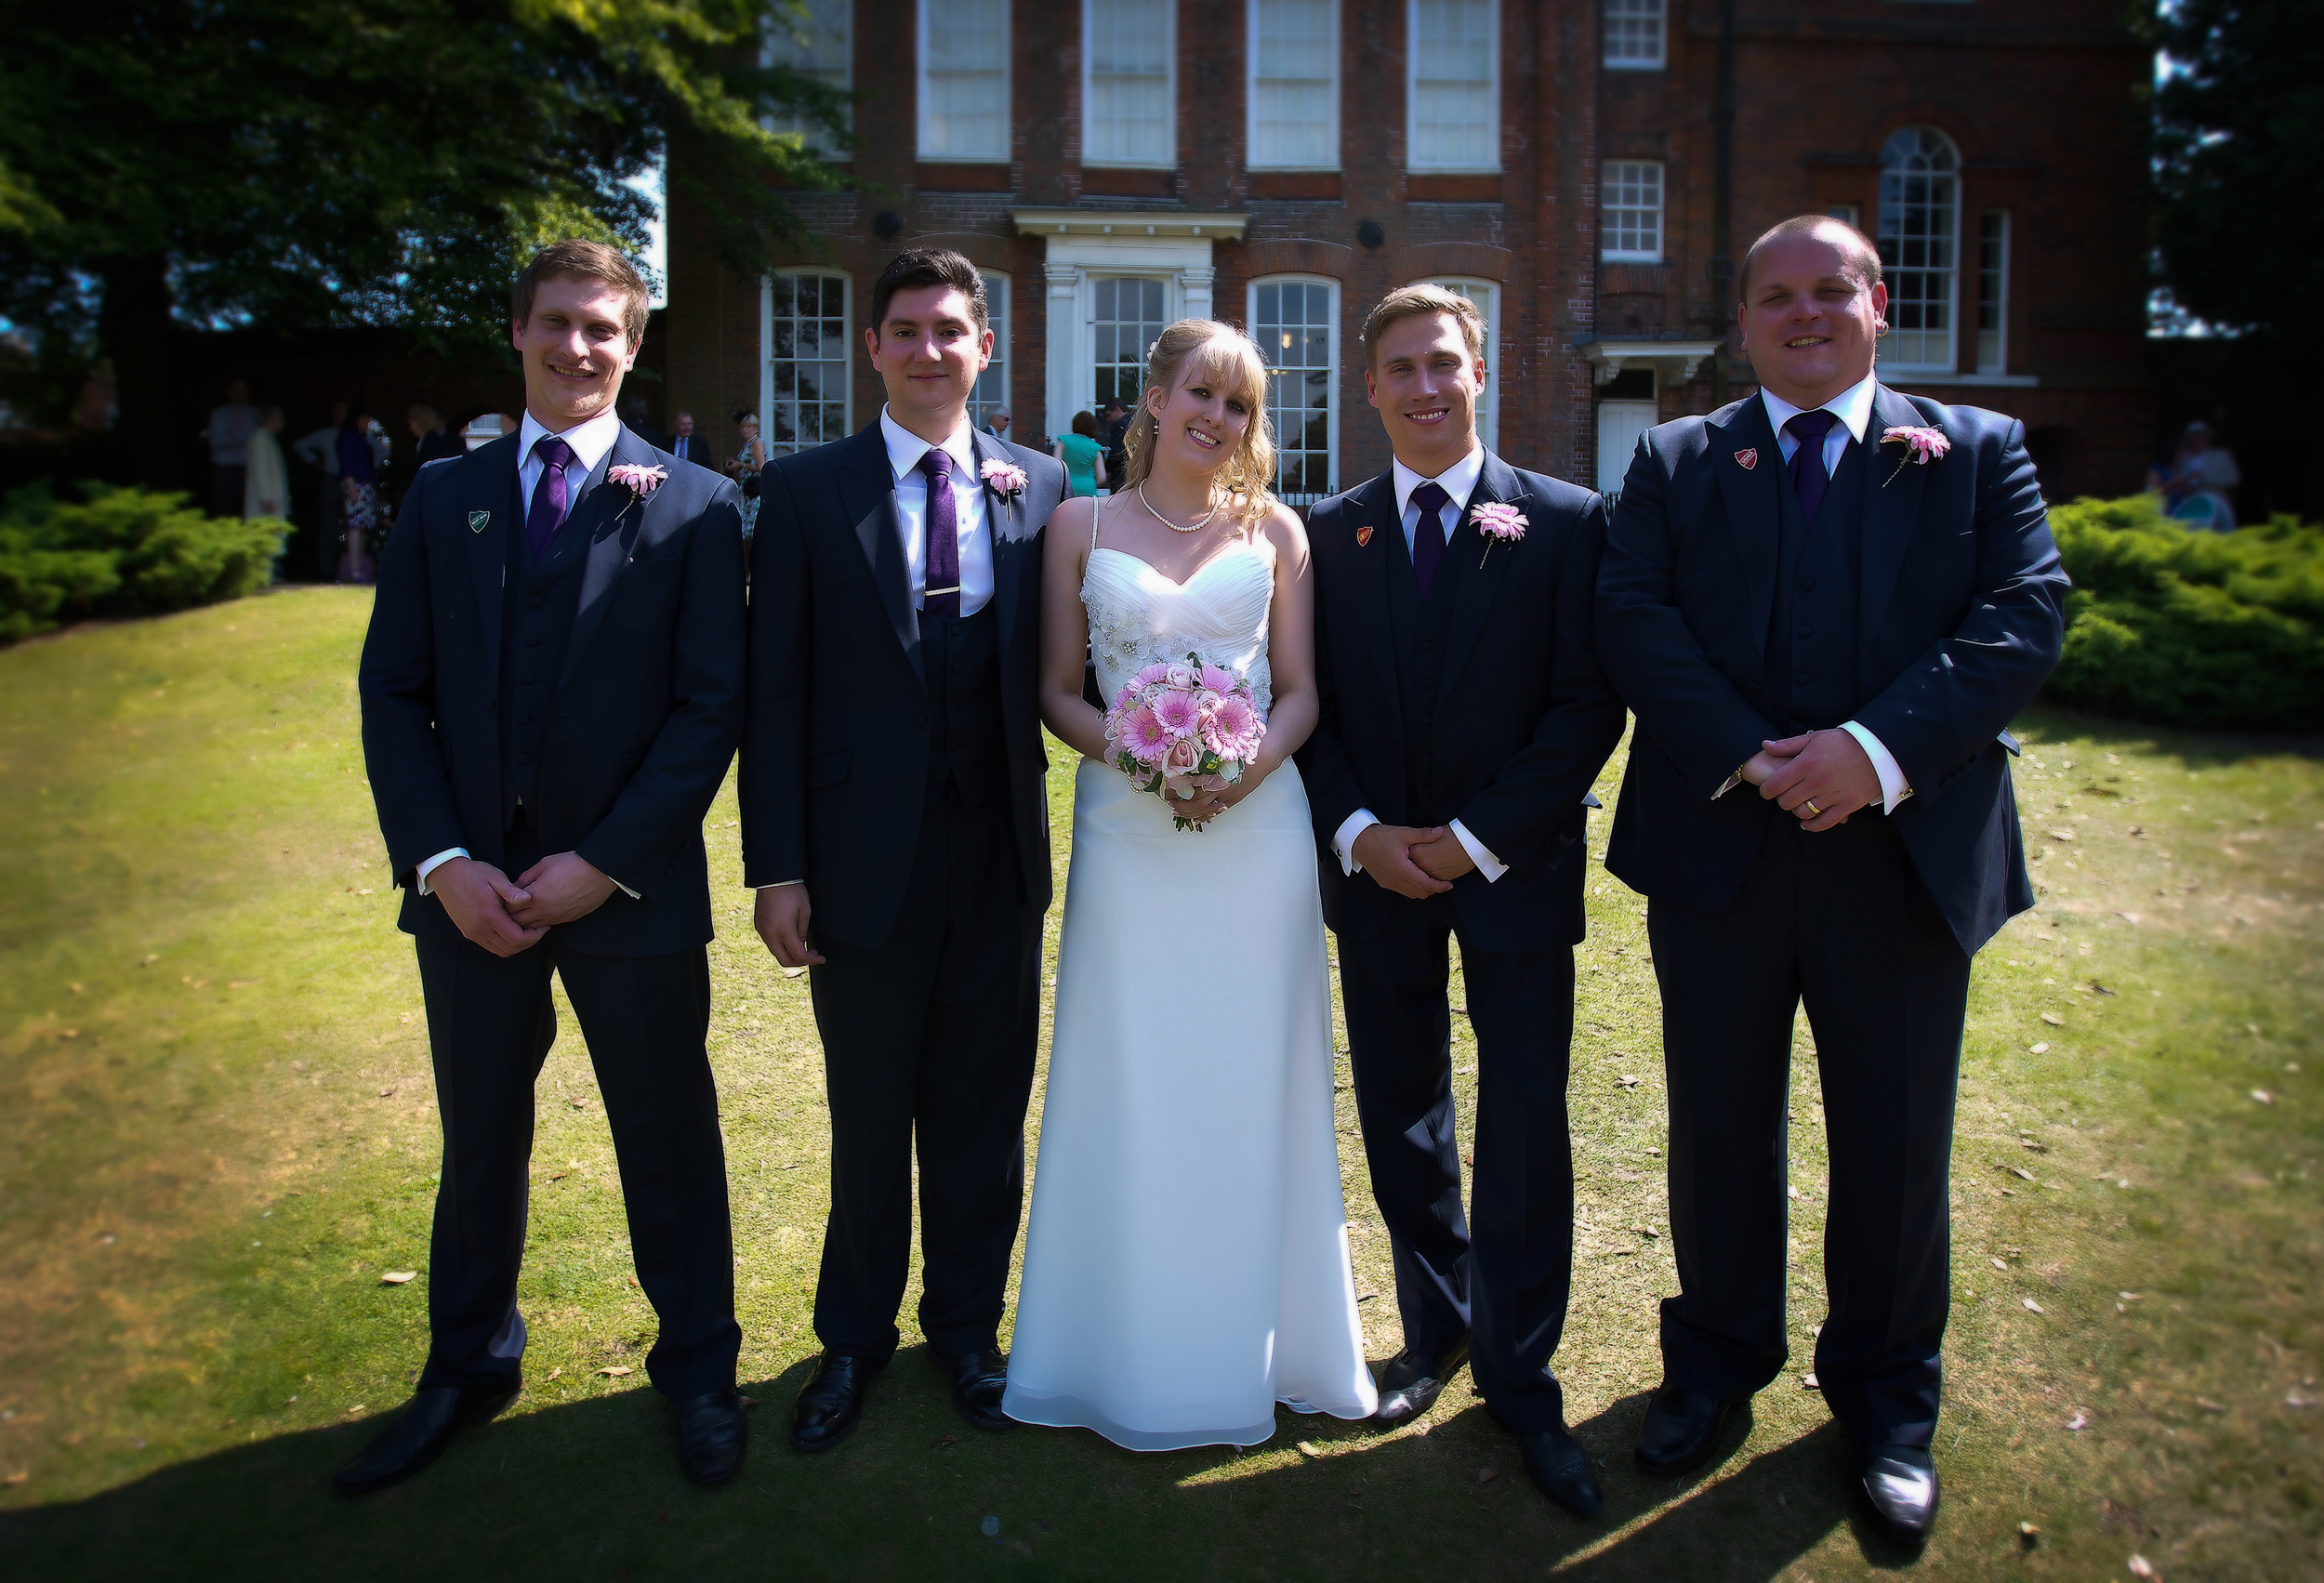 essex-group-shot-london-uk-destination-wedding-photography-Adam-Rowley